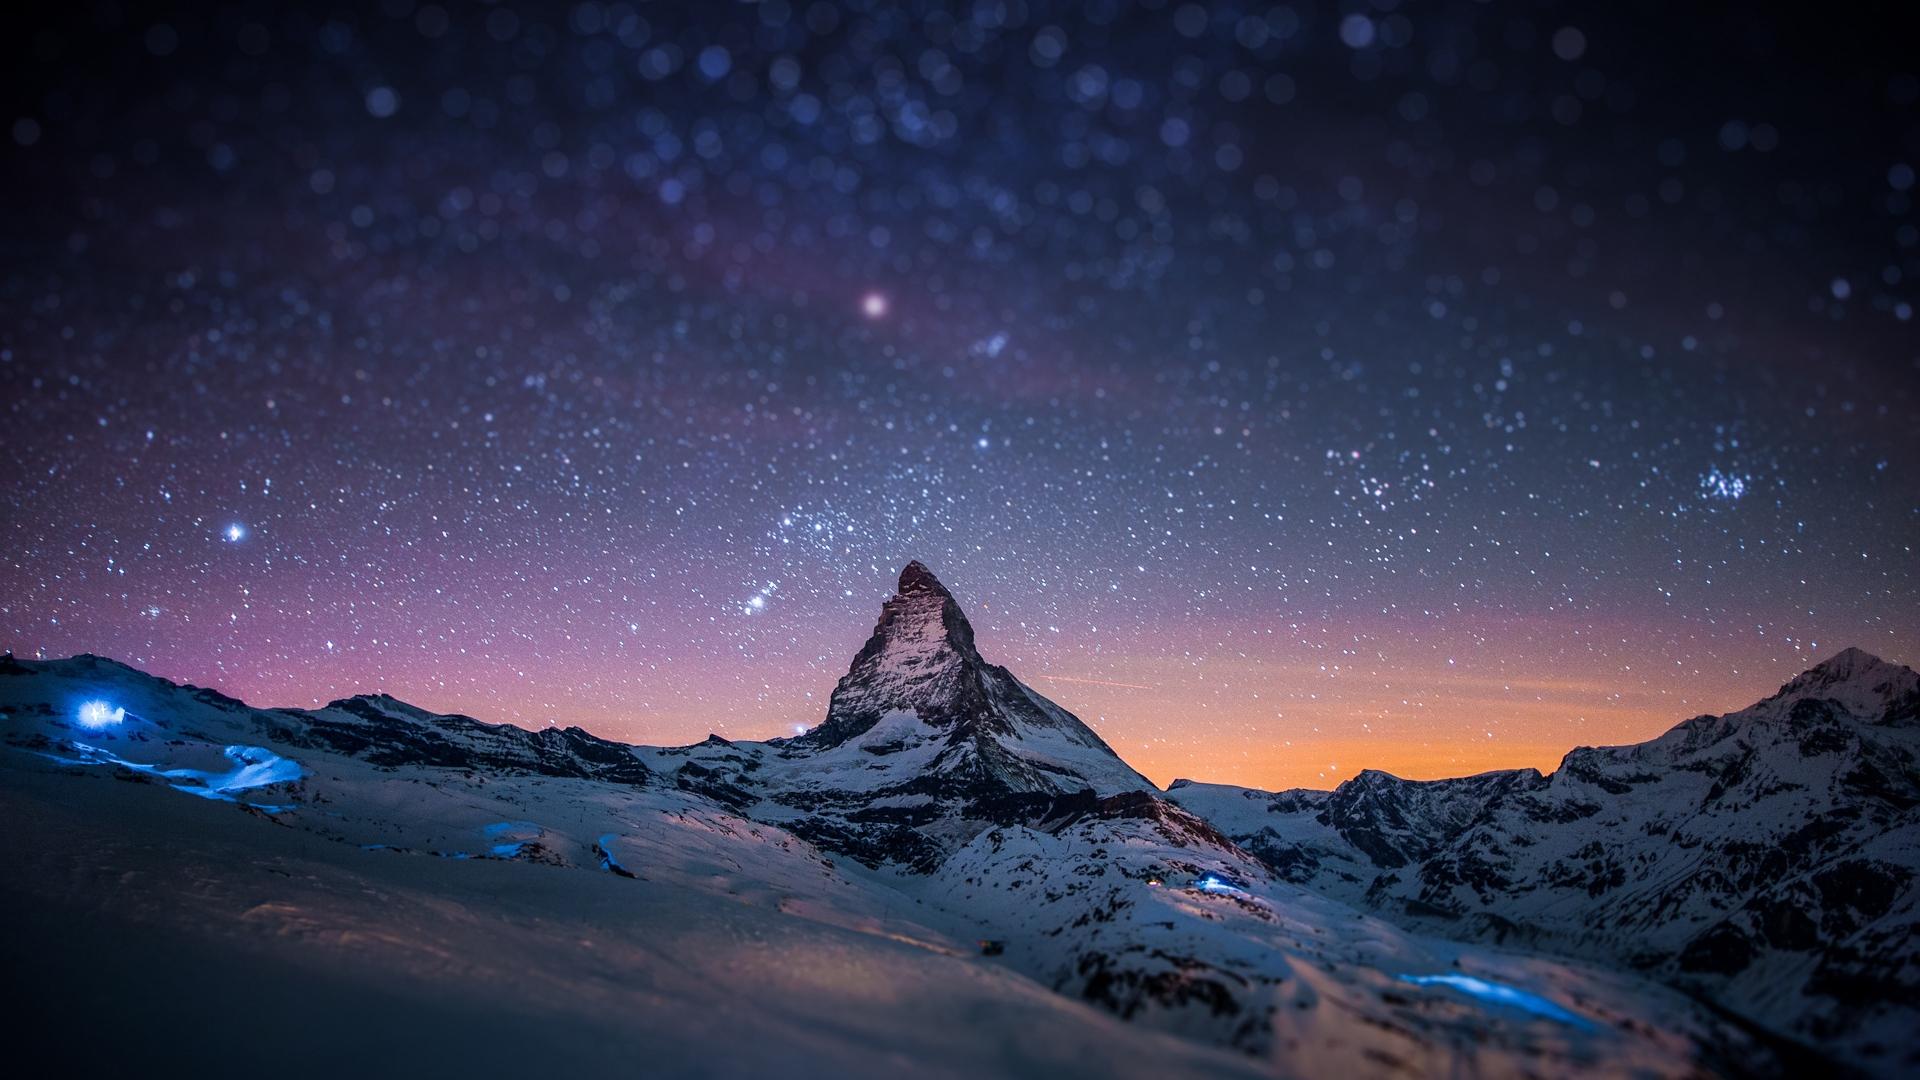 Free Download Mountain Peak Stars Sky Night Light Snow Full Hd